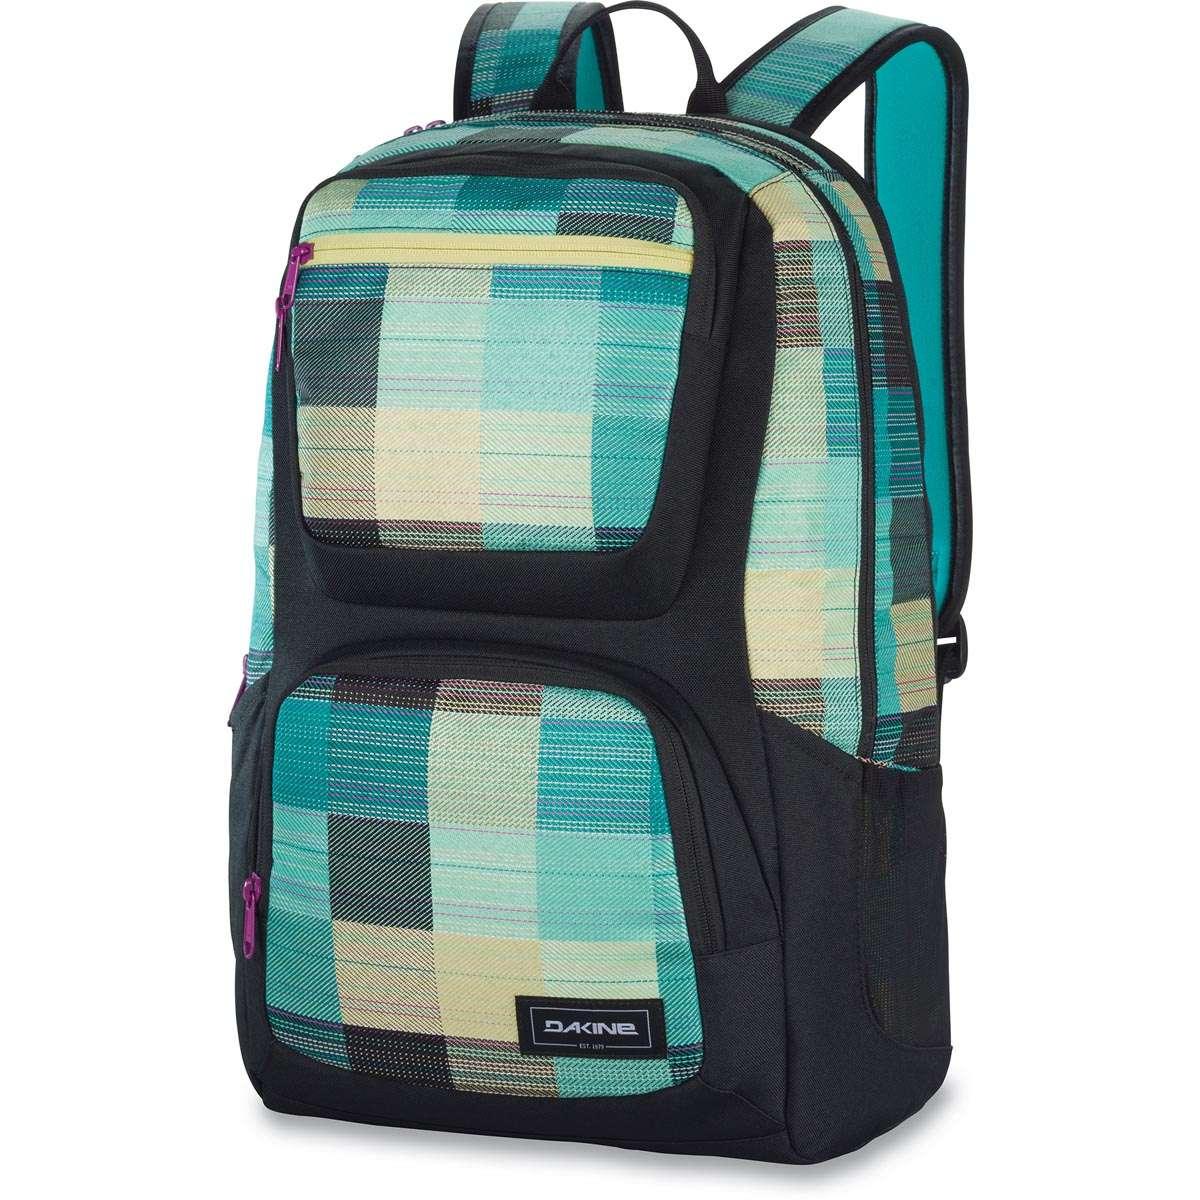 52e65a726a79f Dakine Jewel 26L Backpack Luisa